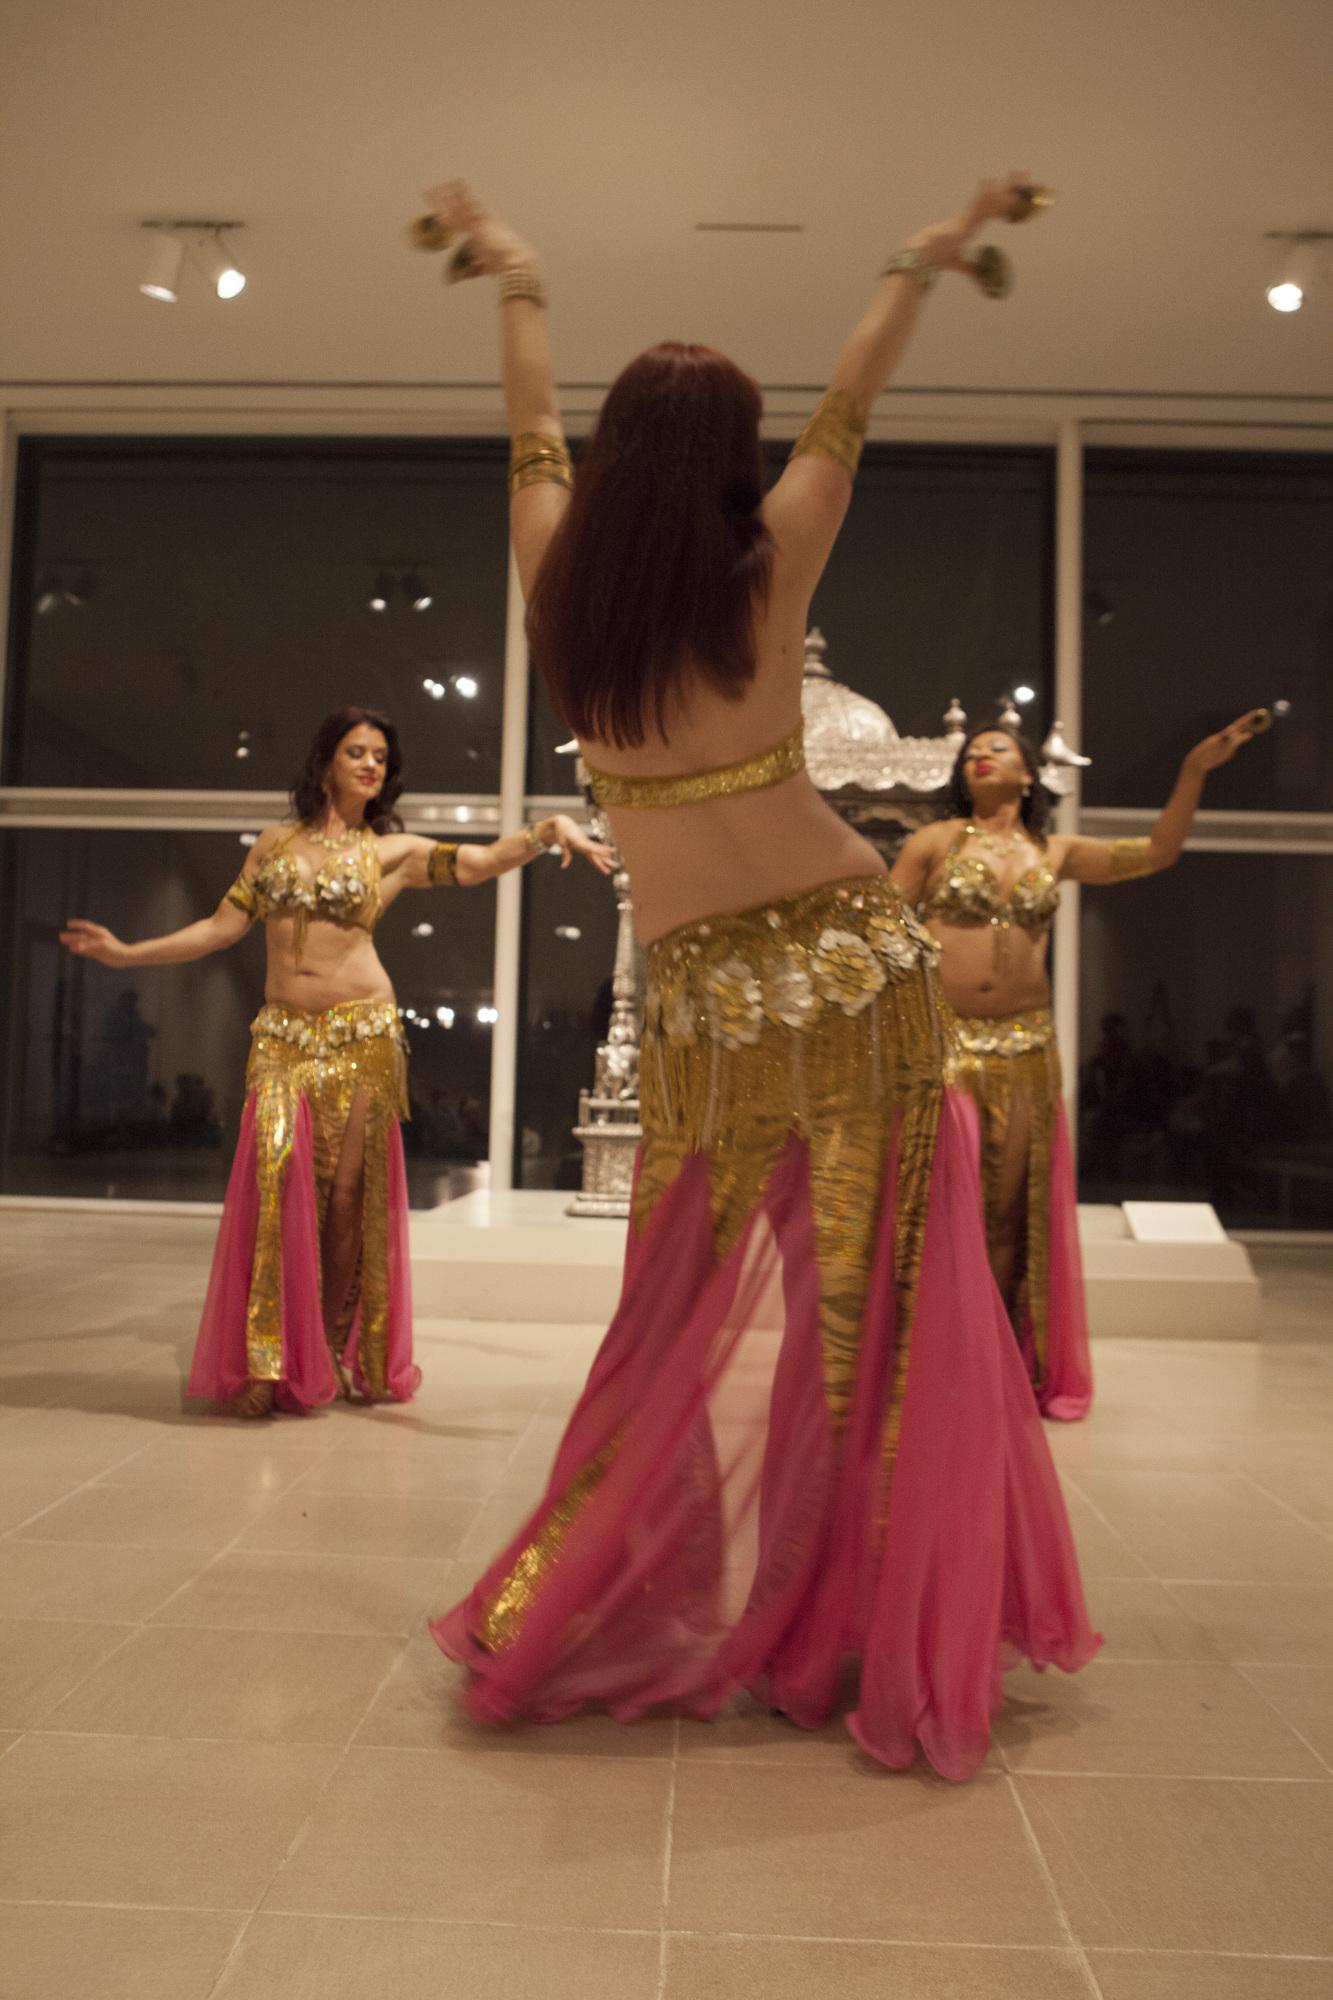 Dallas Belly Dance  - NaDi El Raks